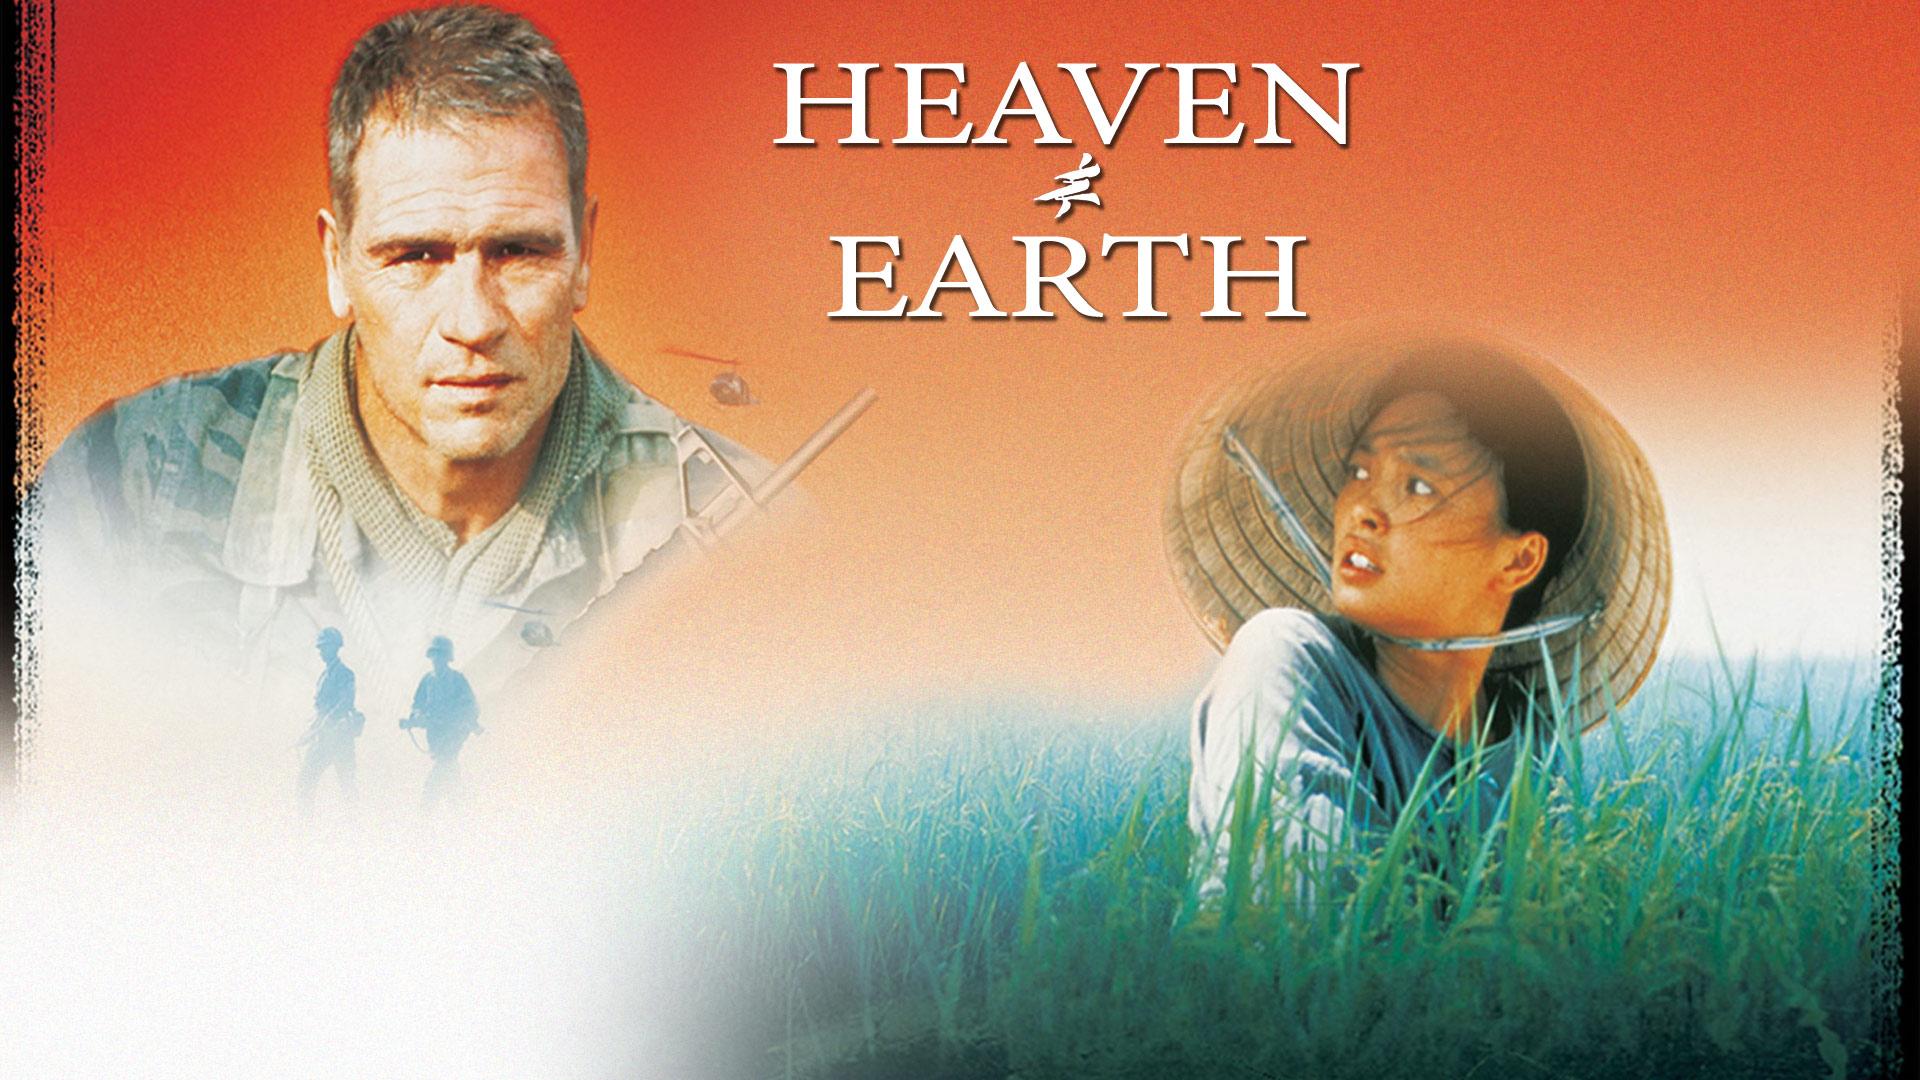 Heaven and Earth (1993)